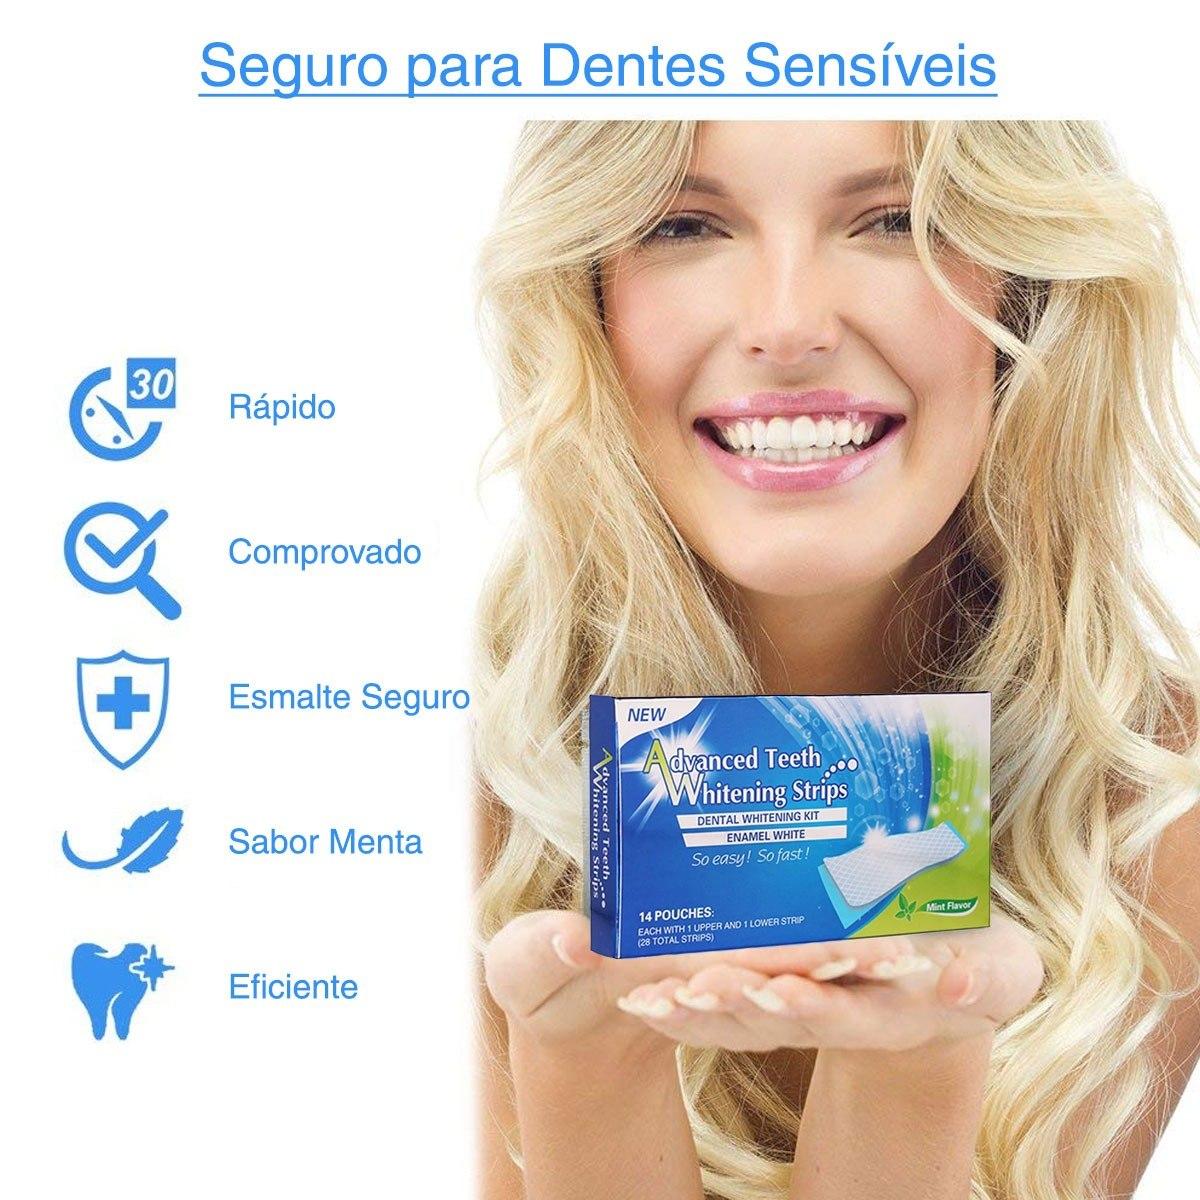 Fita Clareadora Dental Clareamento Dentes 28 Tira White Gel R 34